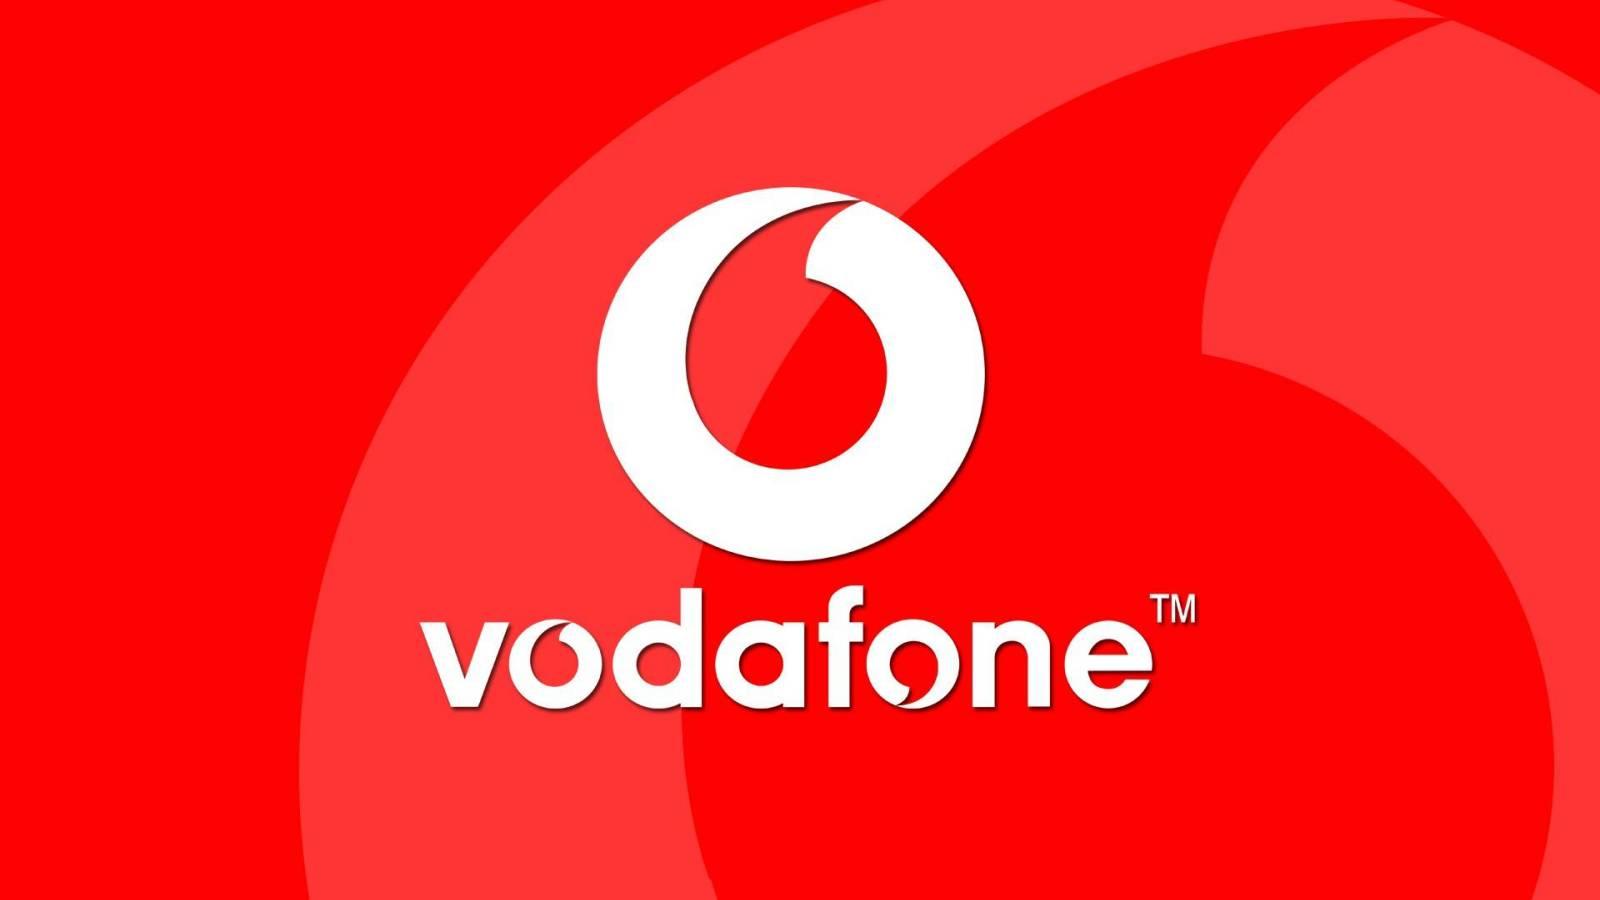 Vodafone filme paste